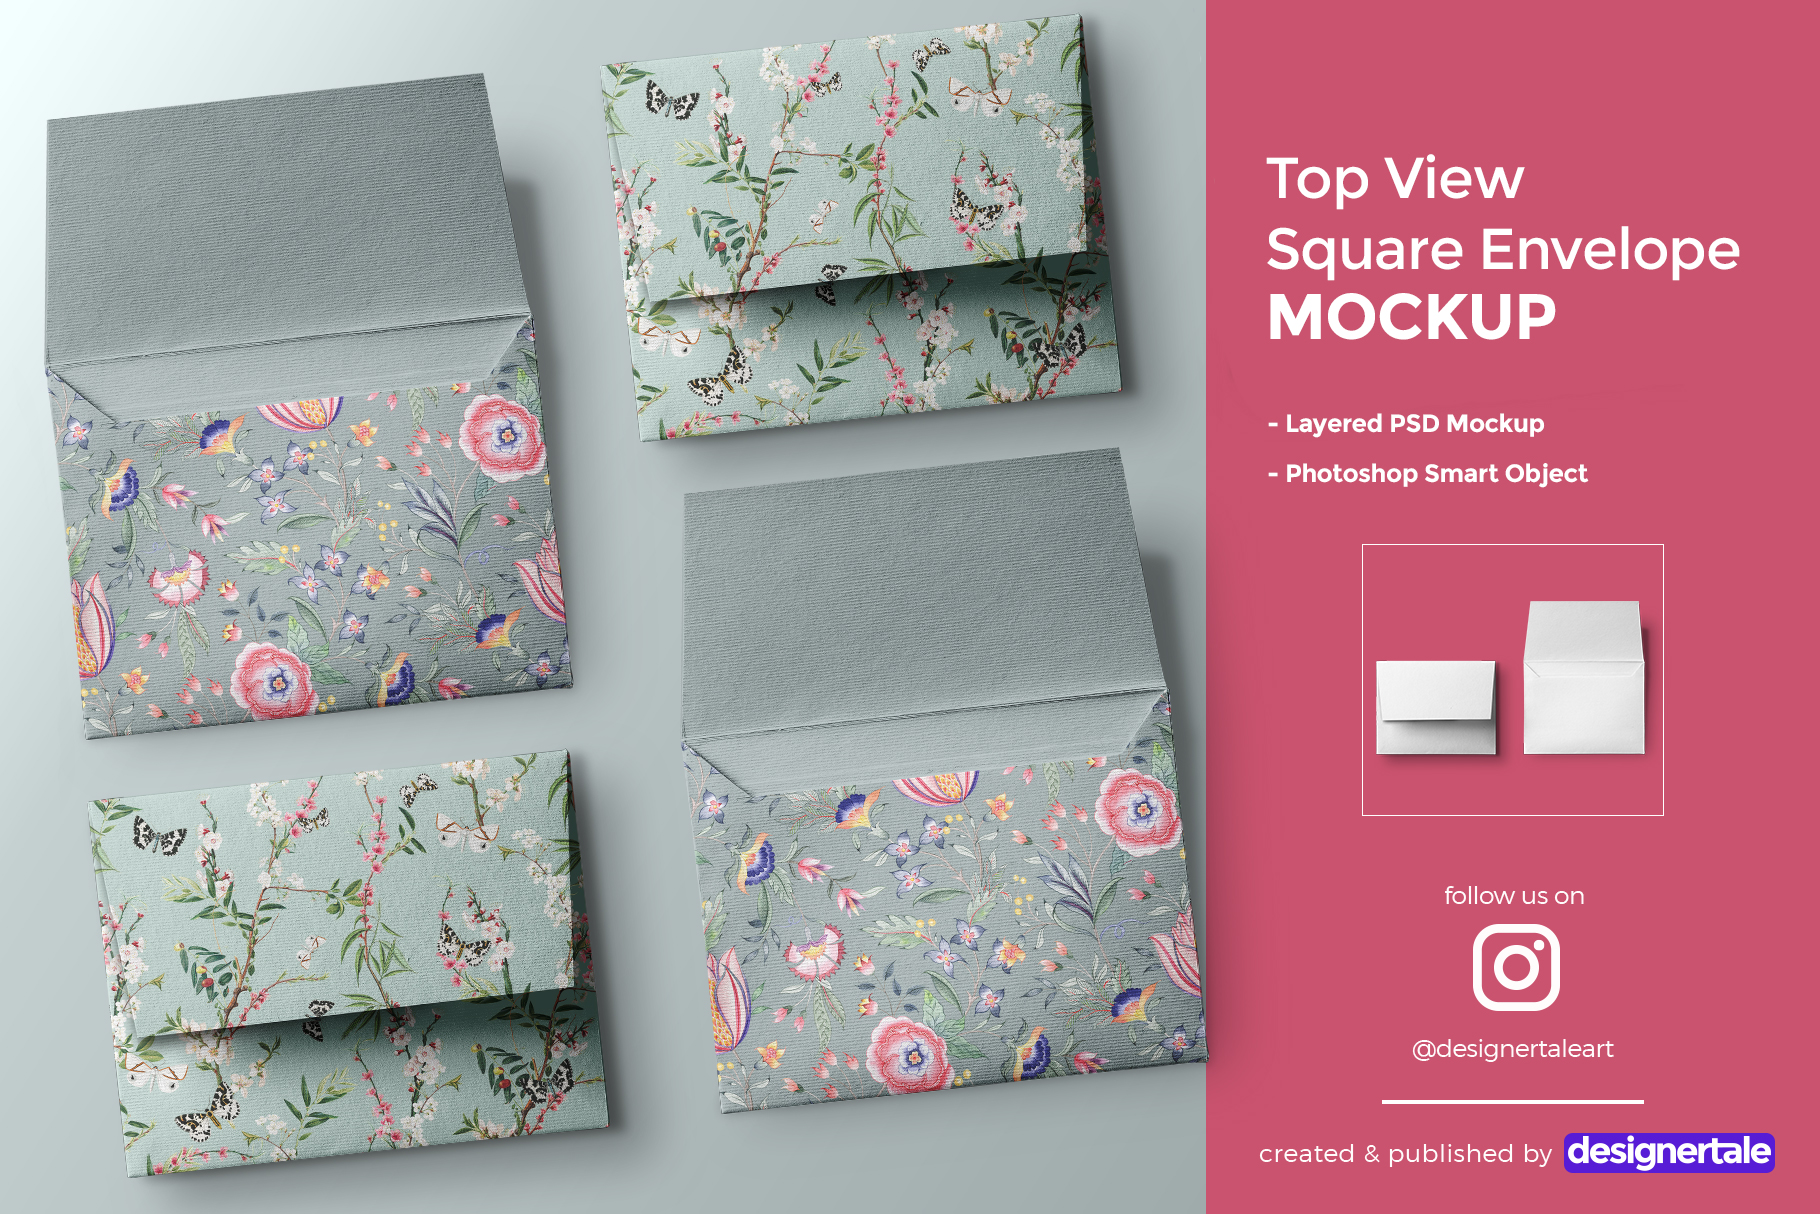 top view square envelope mockup